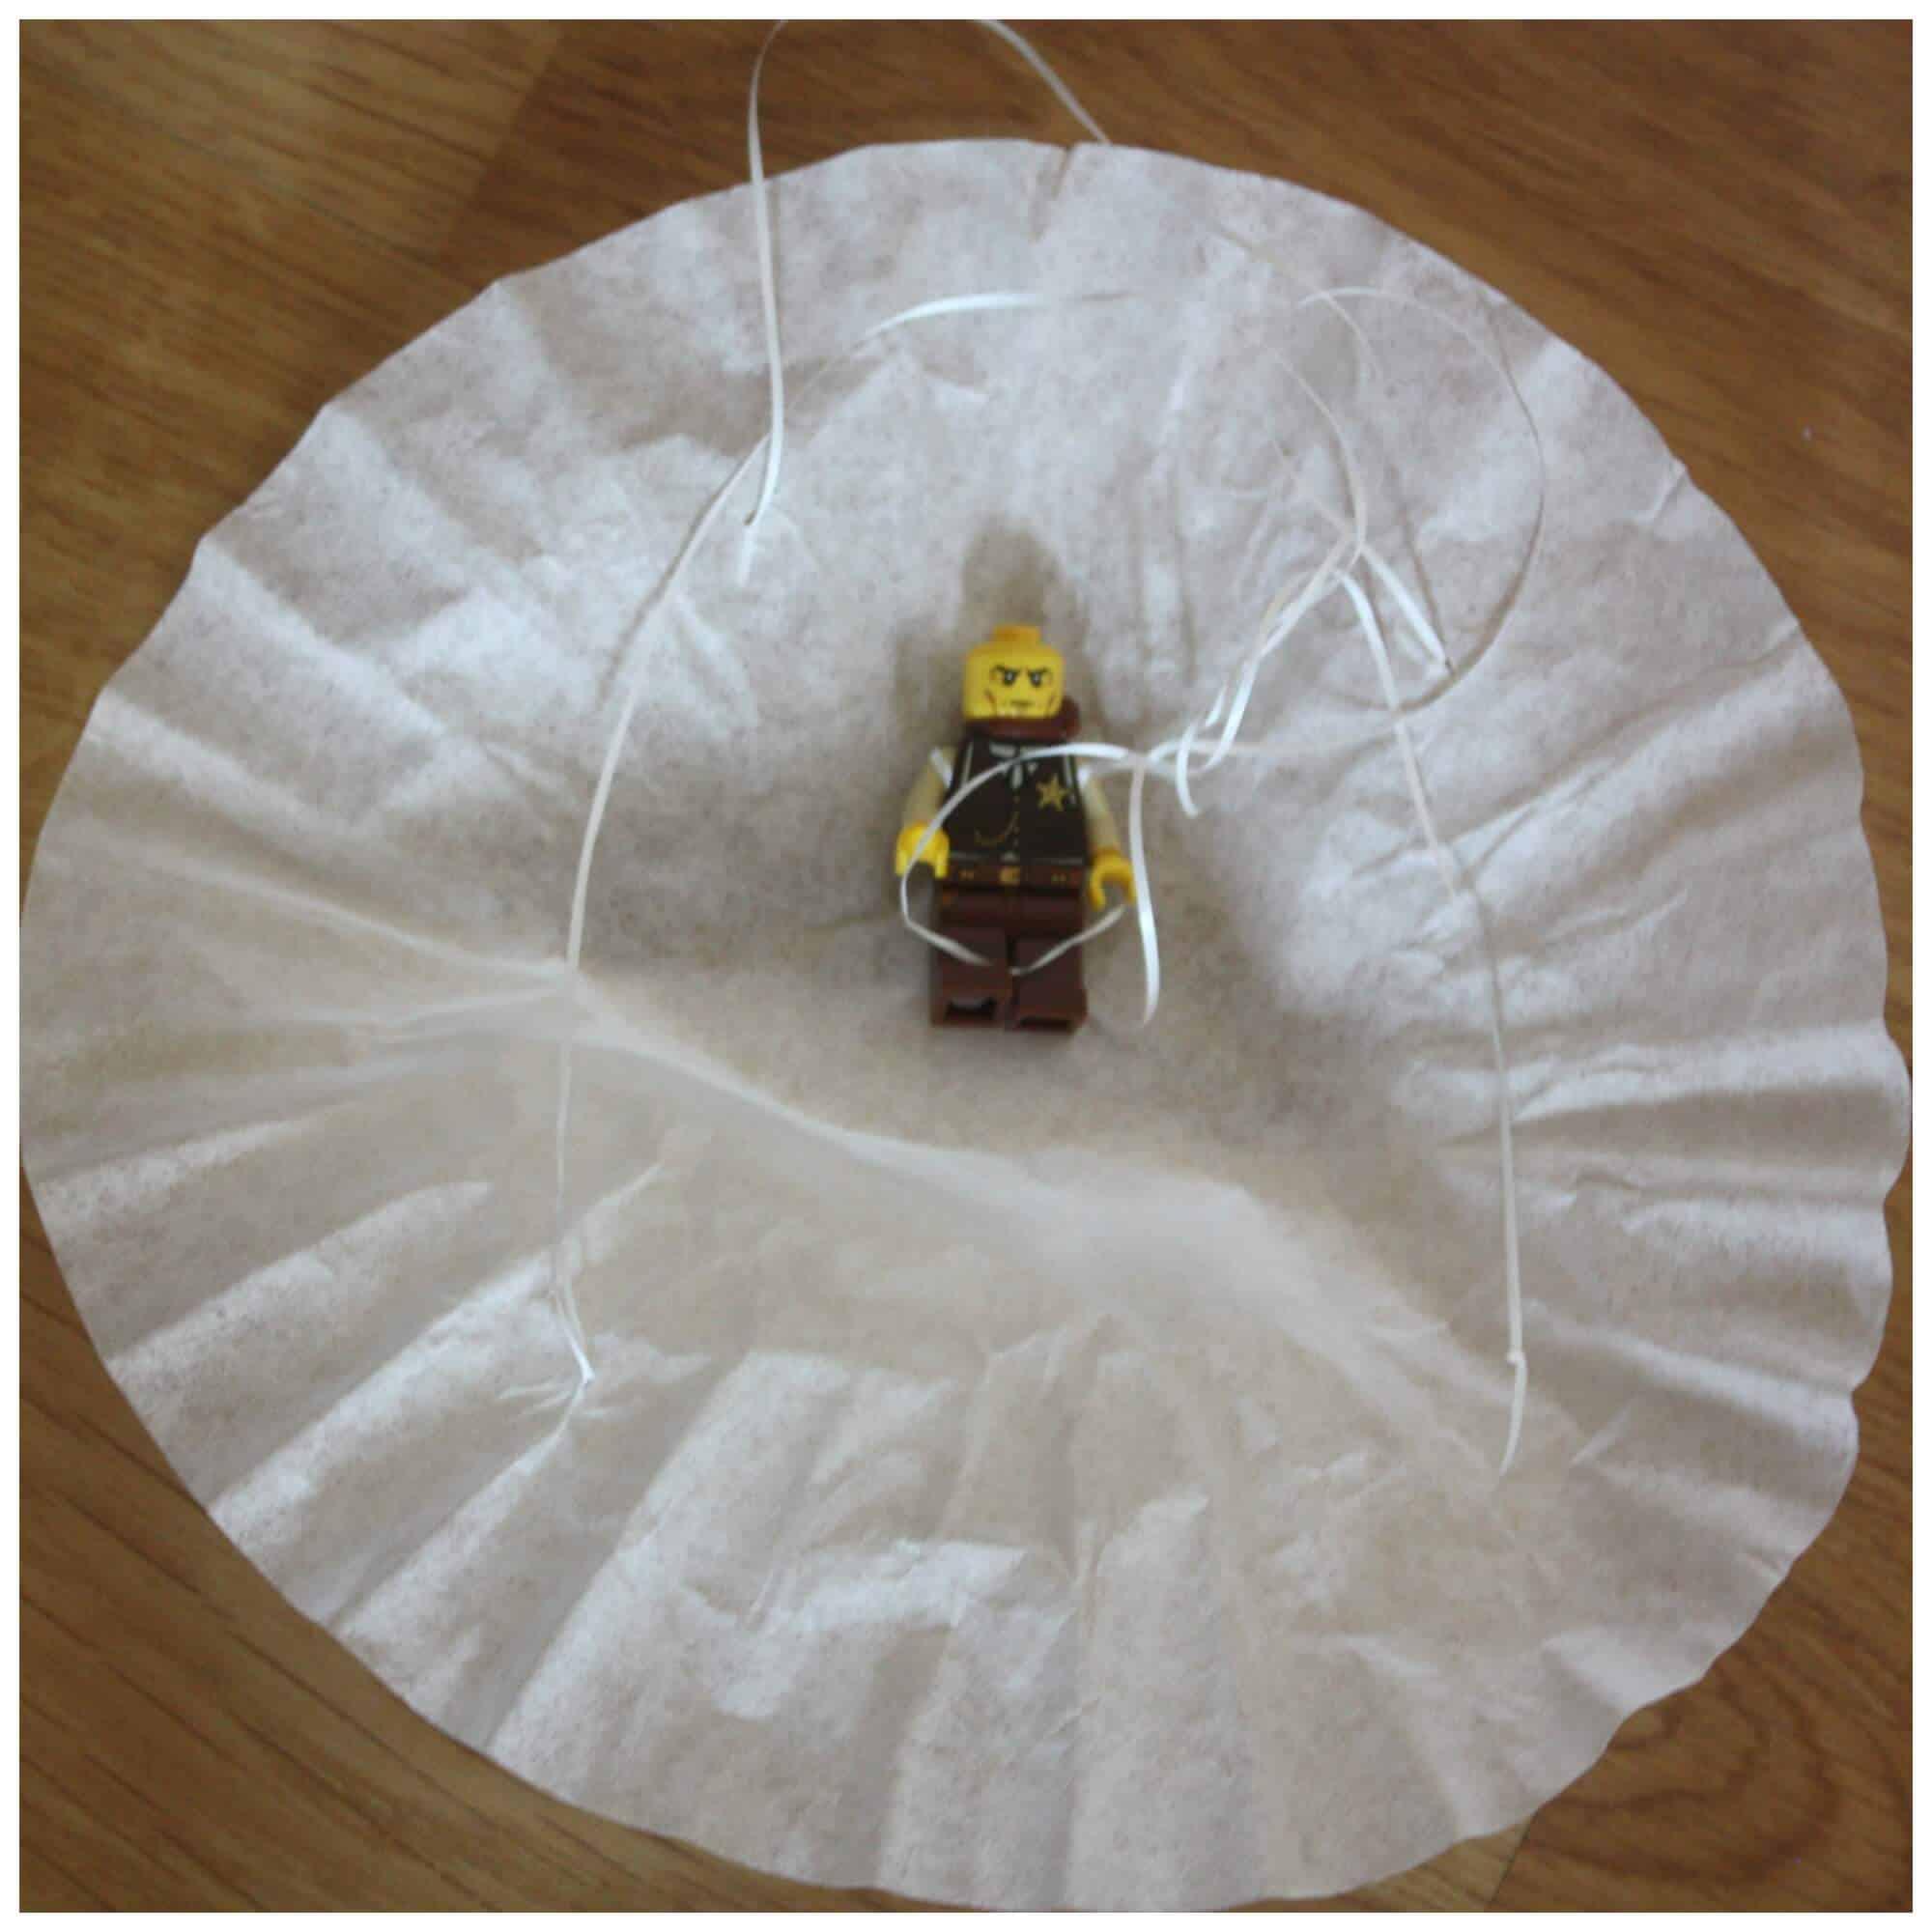 Coffee Filter Parachute Lego Minifigure Parachute Activity | 2000 x 2000 jpeg 153kB